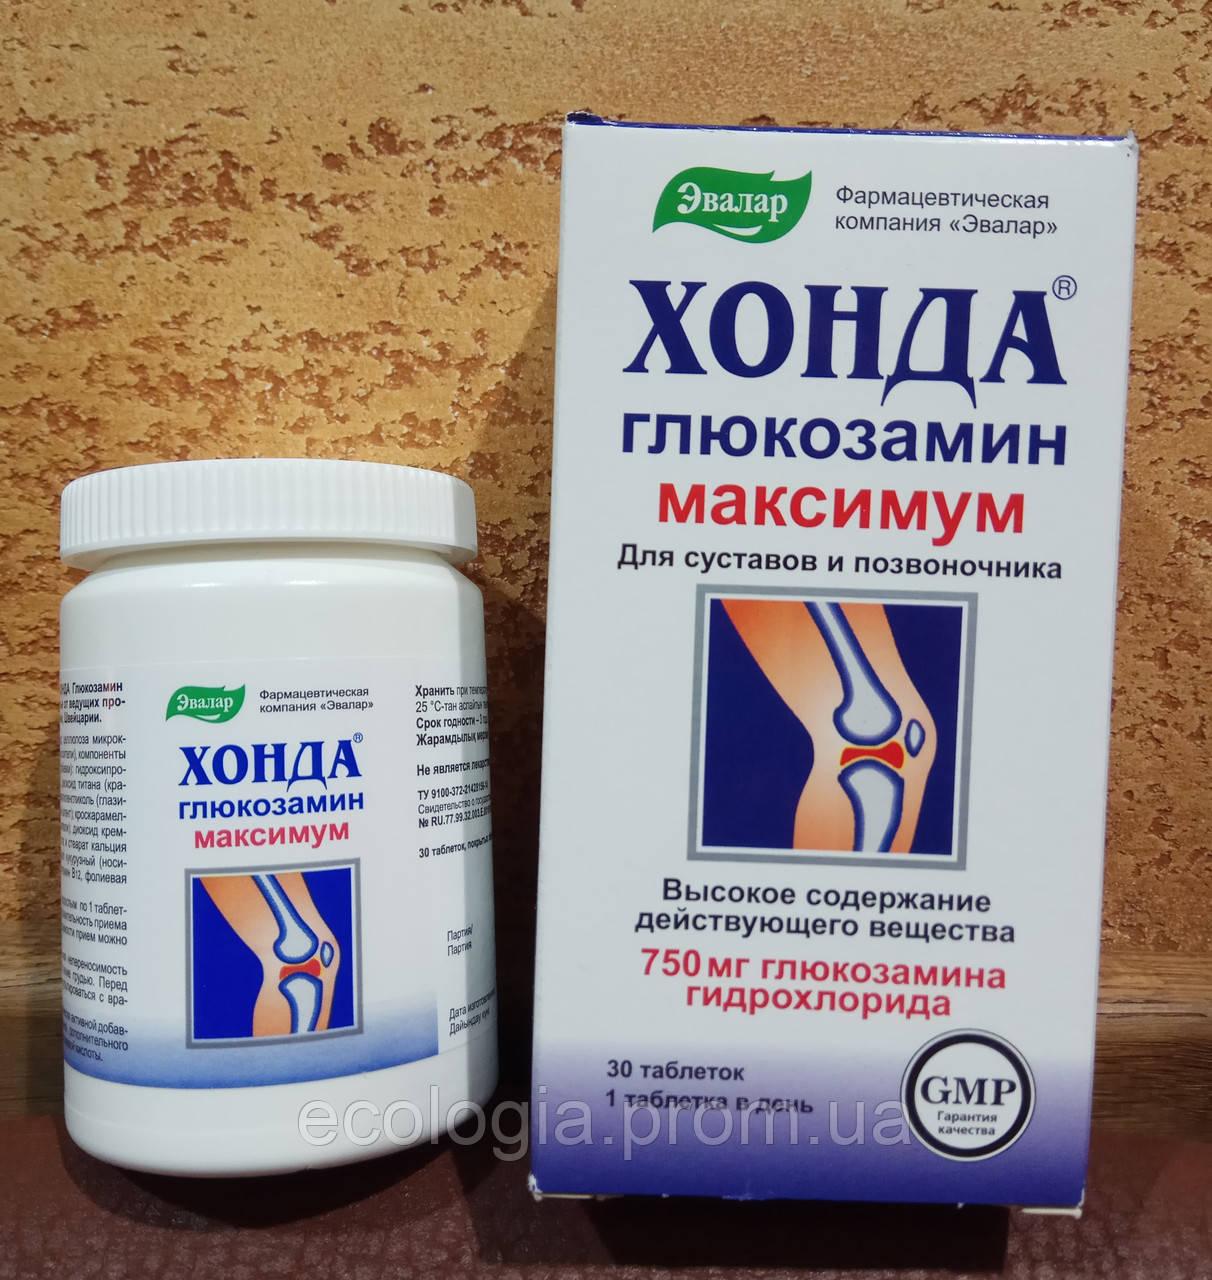 Препарат для суставов ст закона украины болят суставы отжиматься на кулачках